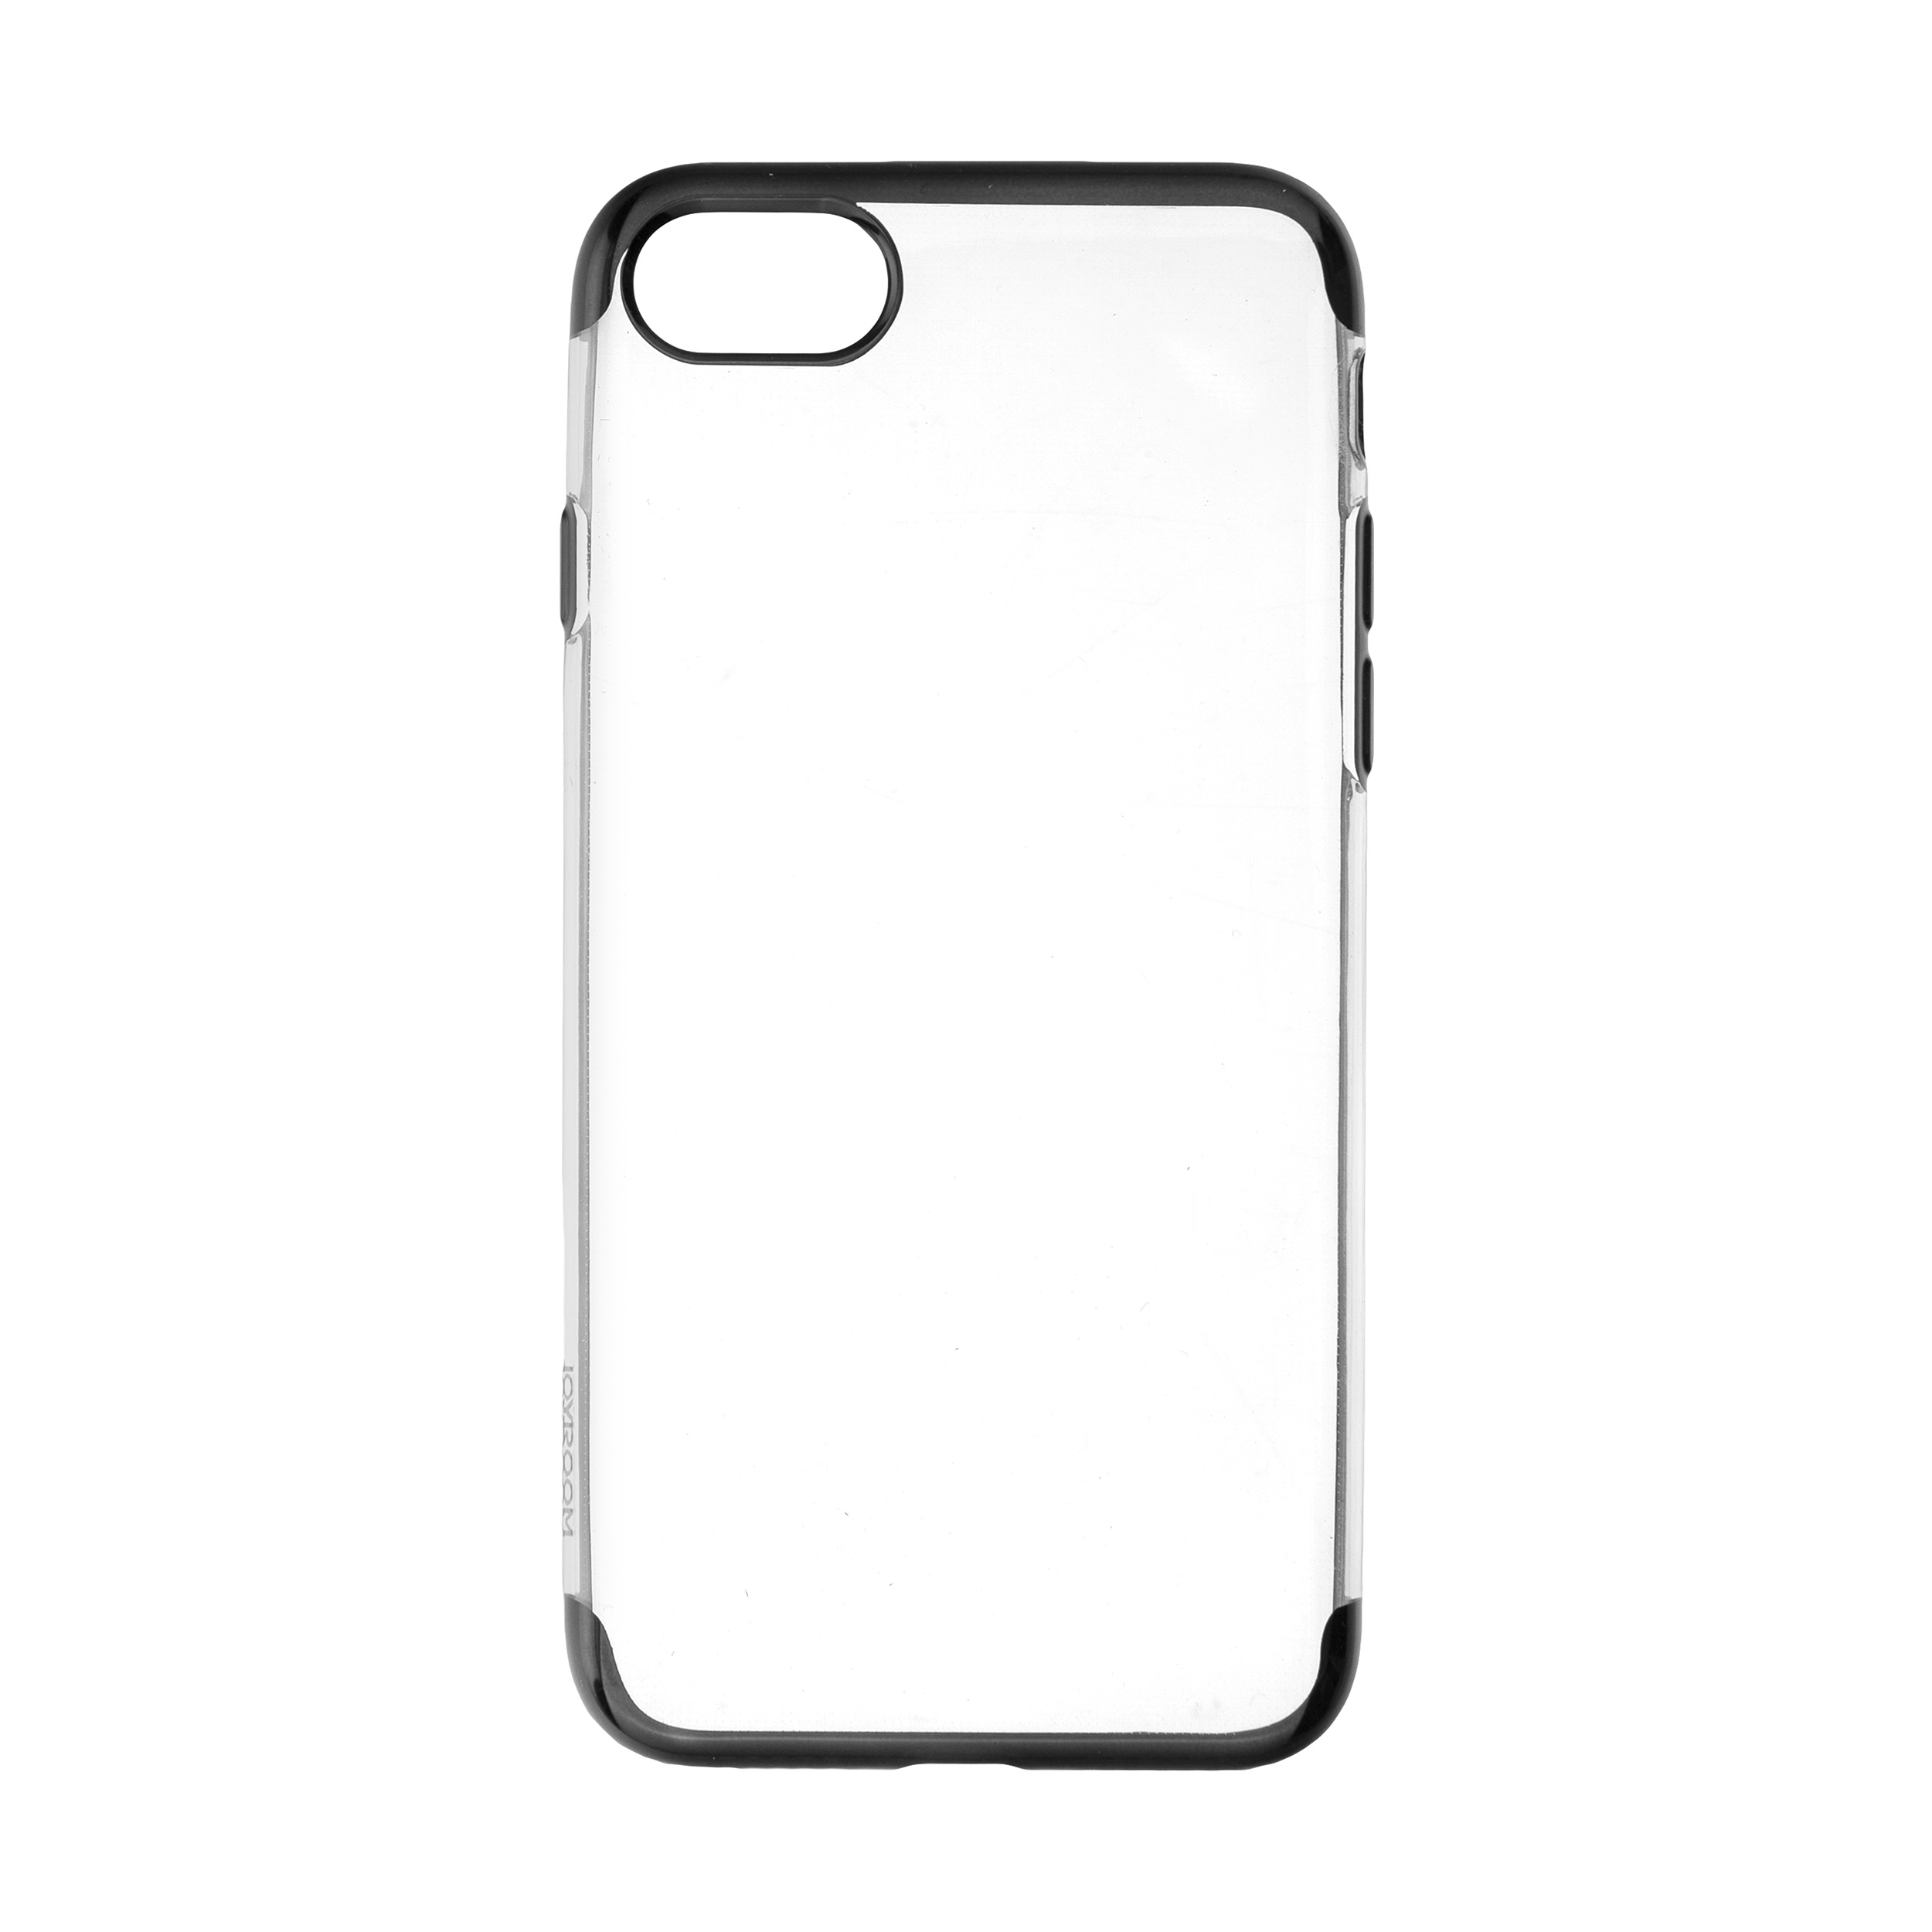 کاور جوی روم مدل JR-BP233 مناسب برای گوشی موبایل اپل iPhone 7